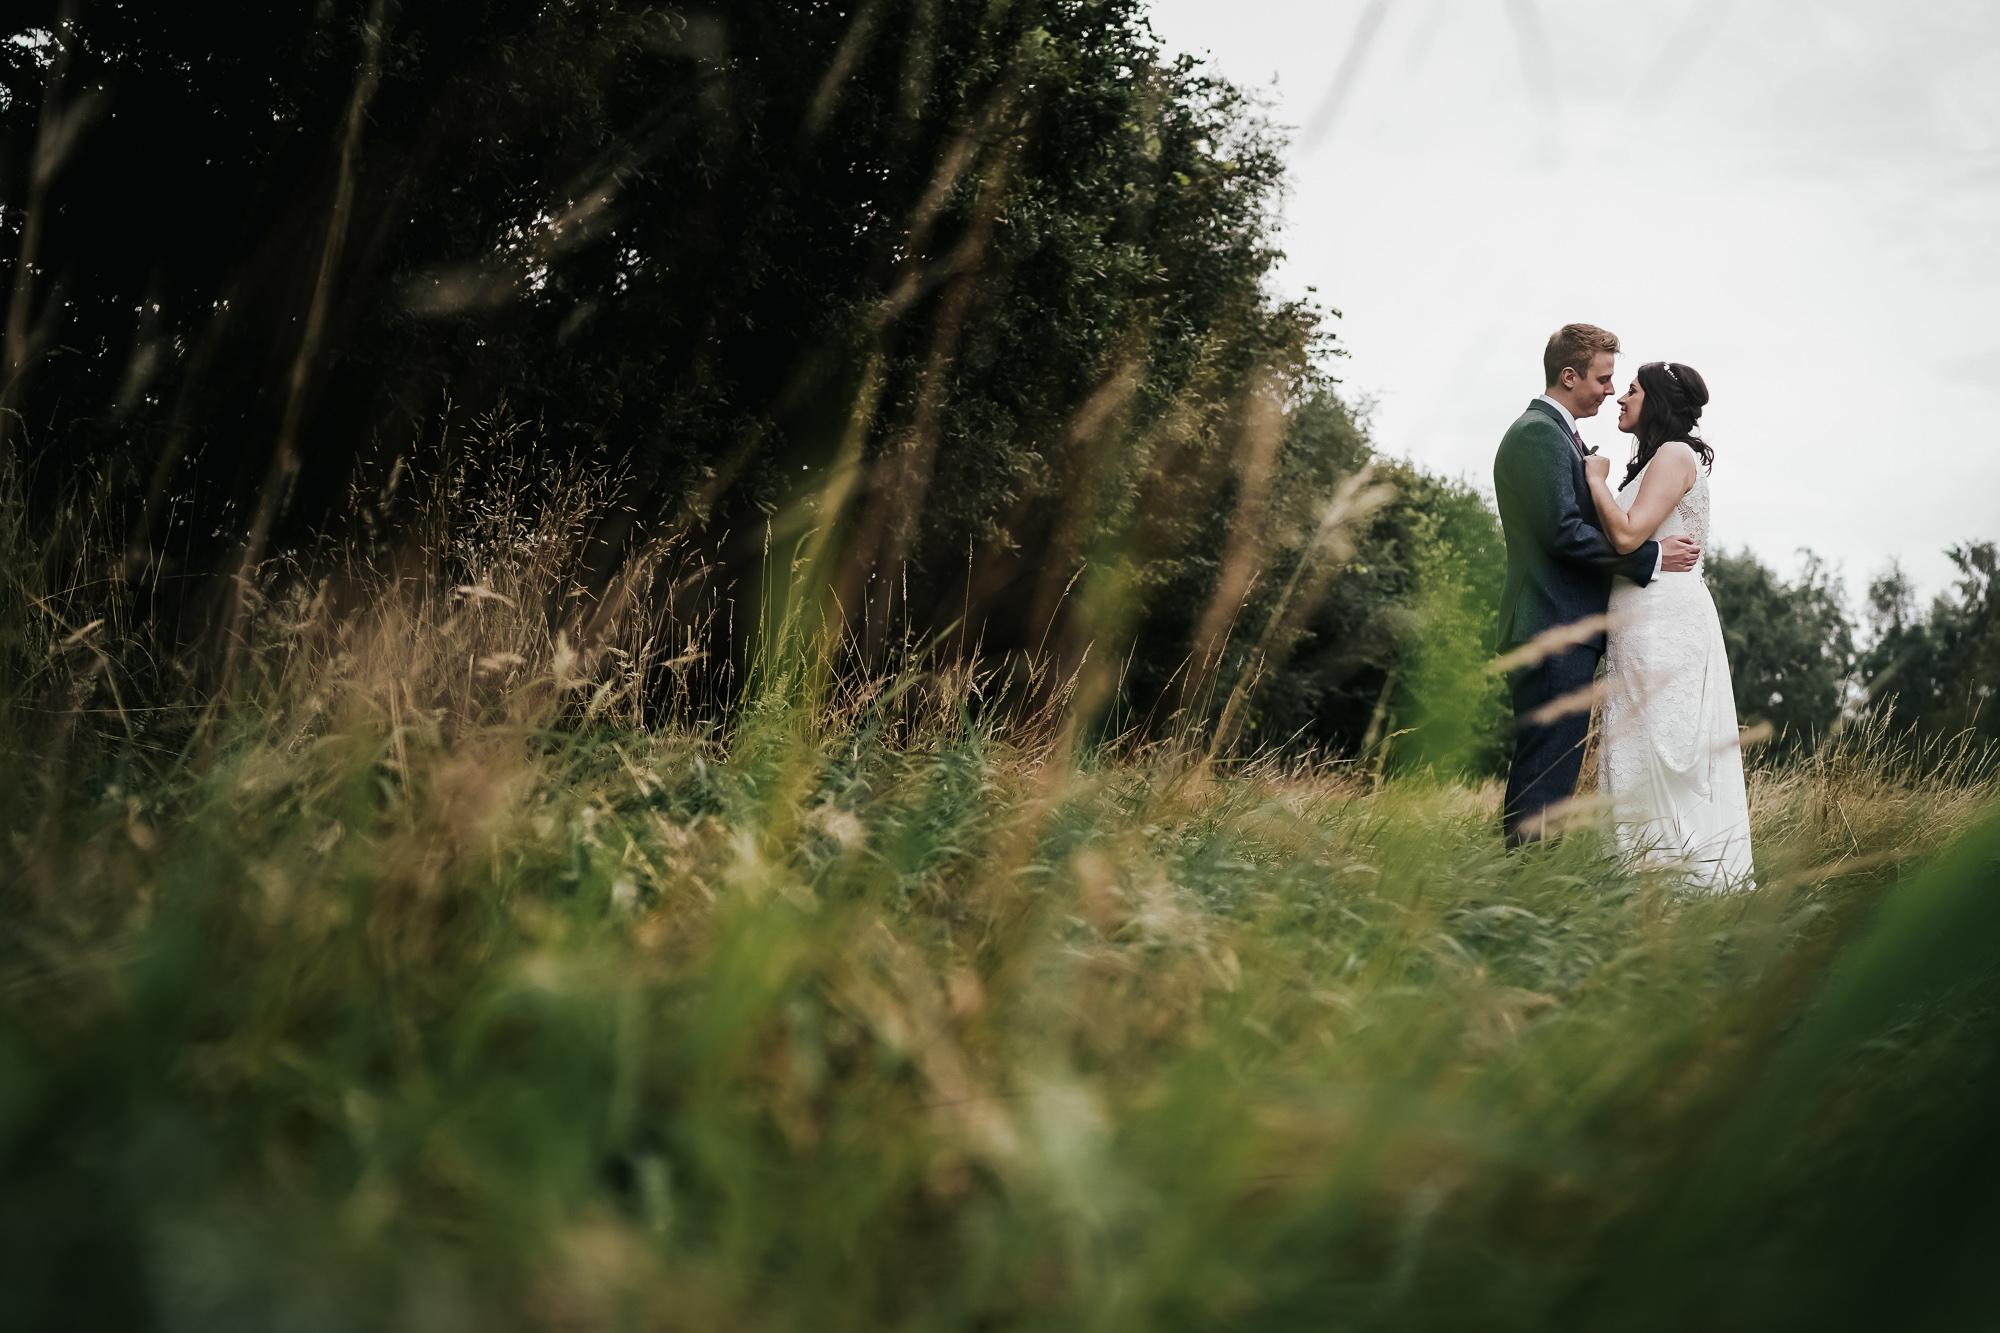 Oak tree of peover wedding photography cheshire wedding photographer (51 of 56).jpg